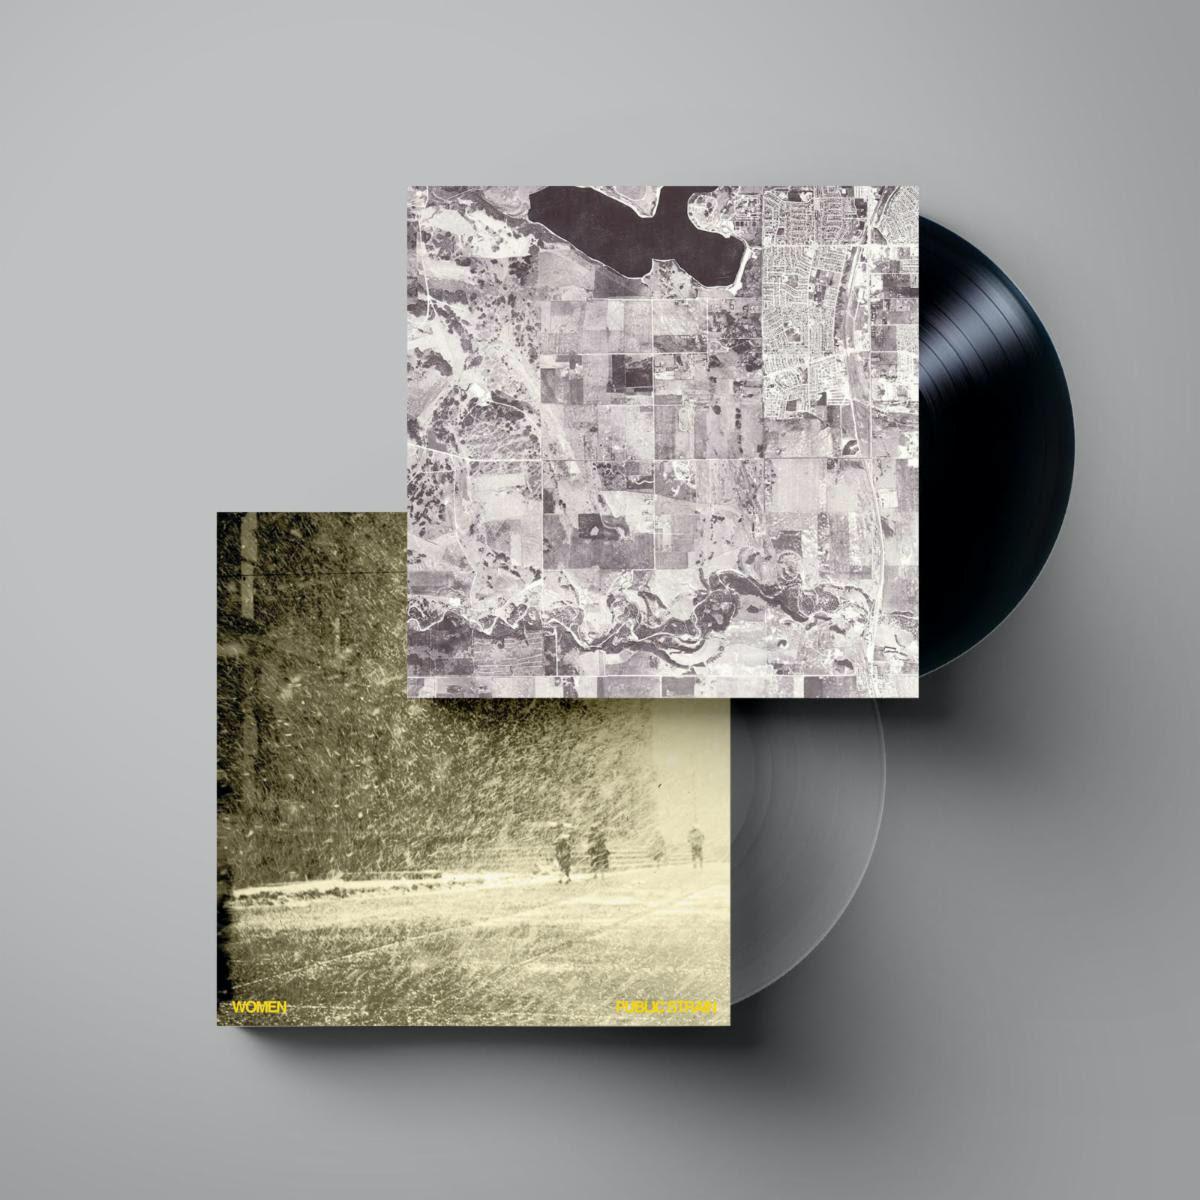 women band 10th anniversary reissue rarities Womens Public Strain to Receive 10th Anniversary Reissue, Rarities EP